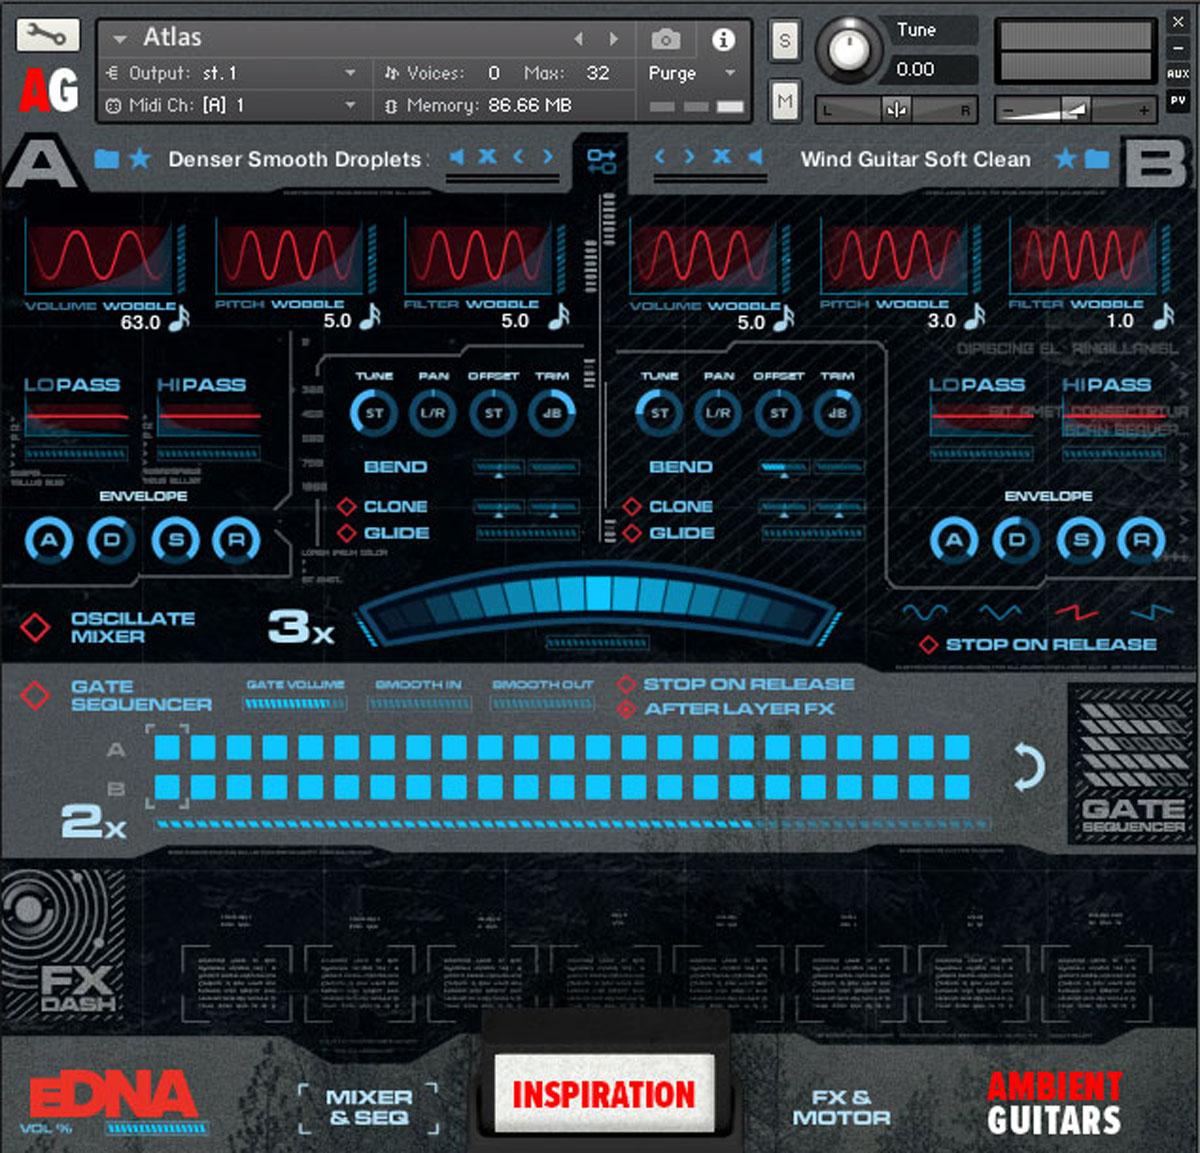 Spitfire Audio announces availability of AMBIENT GUITARS